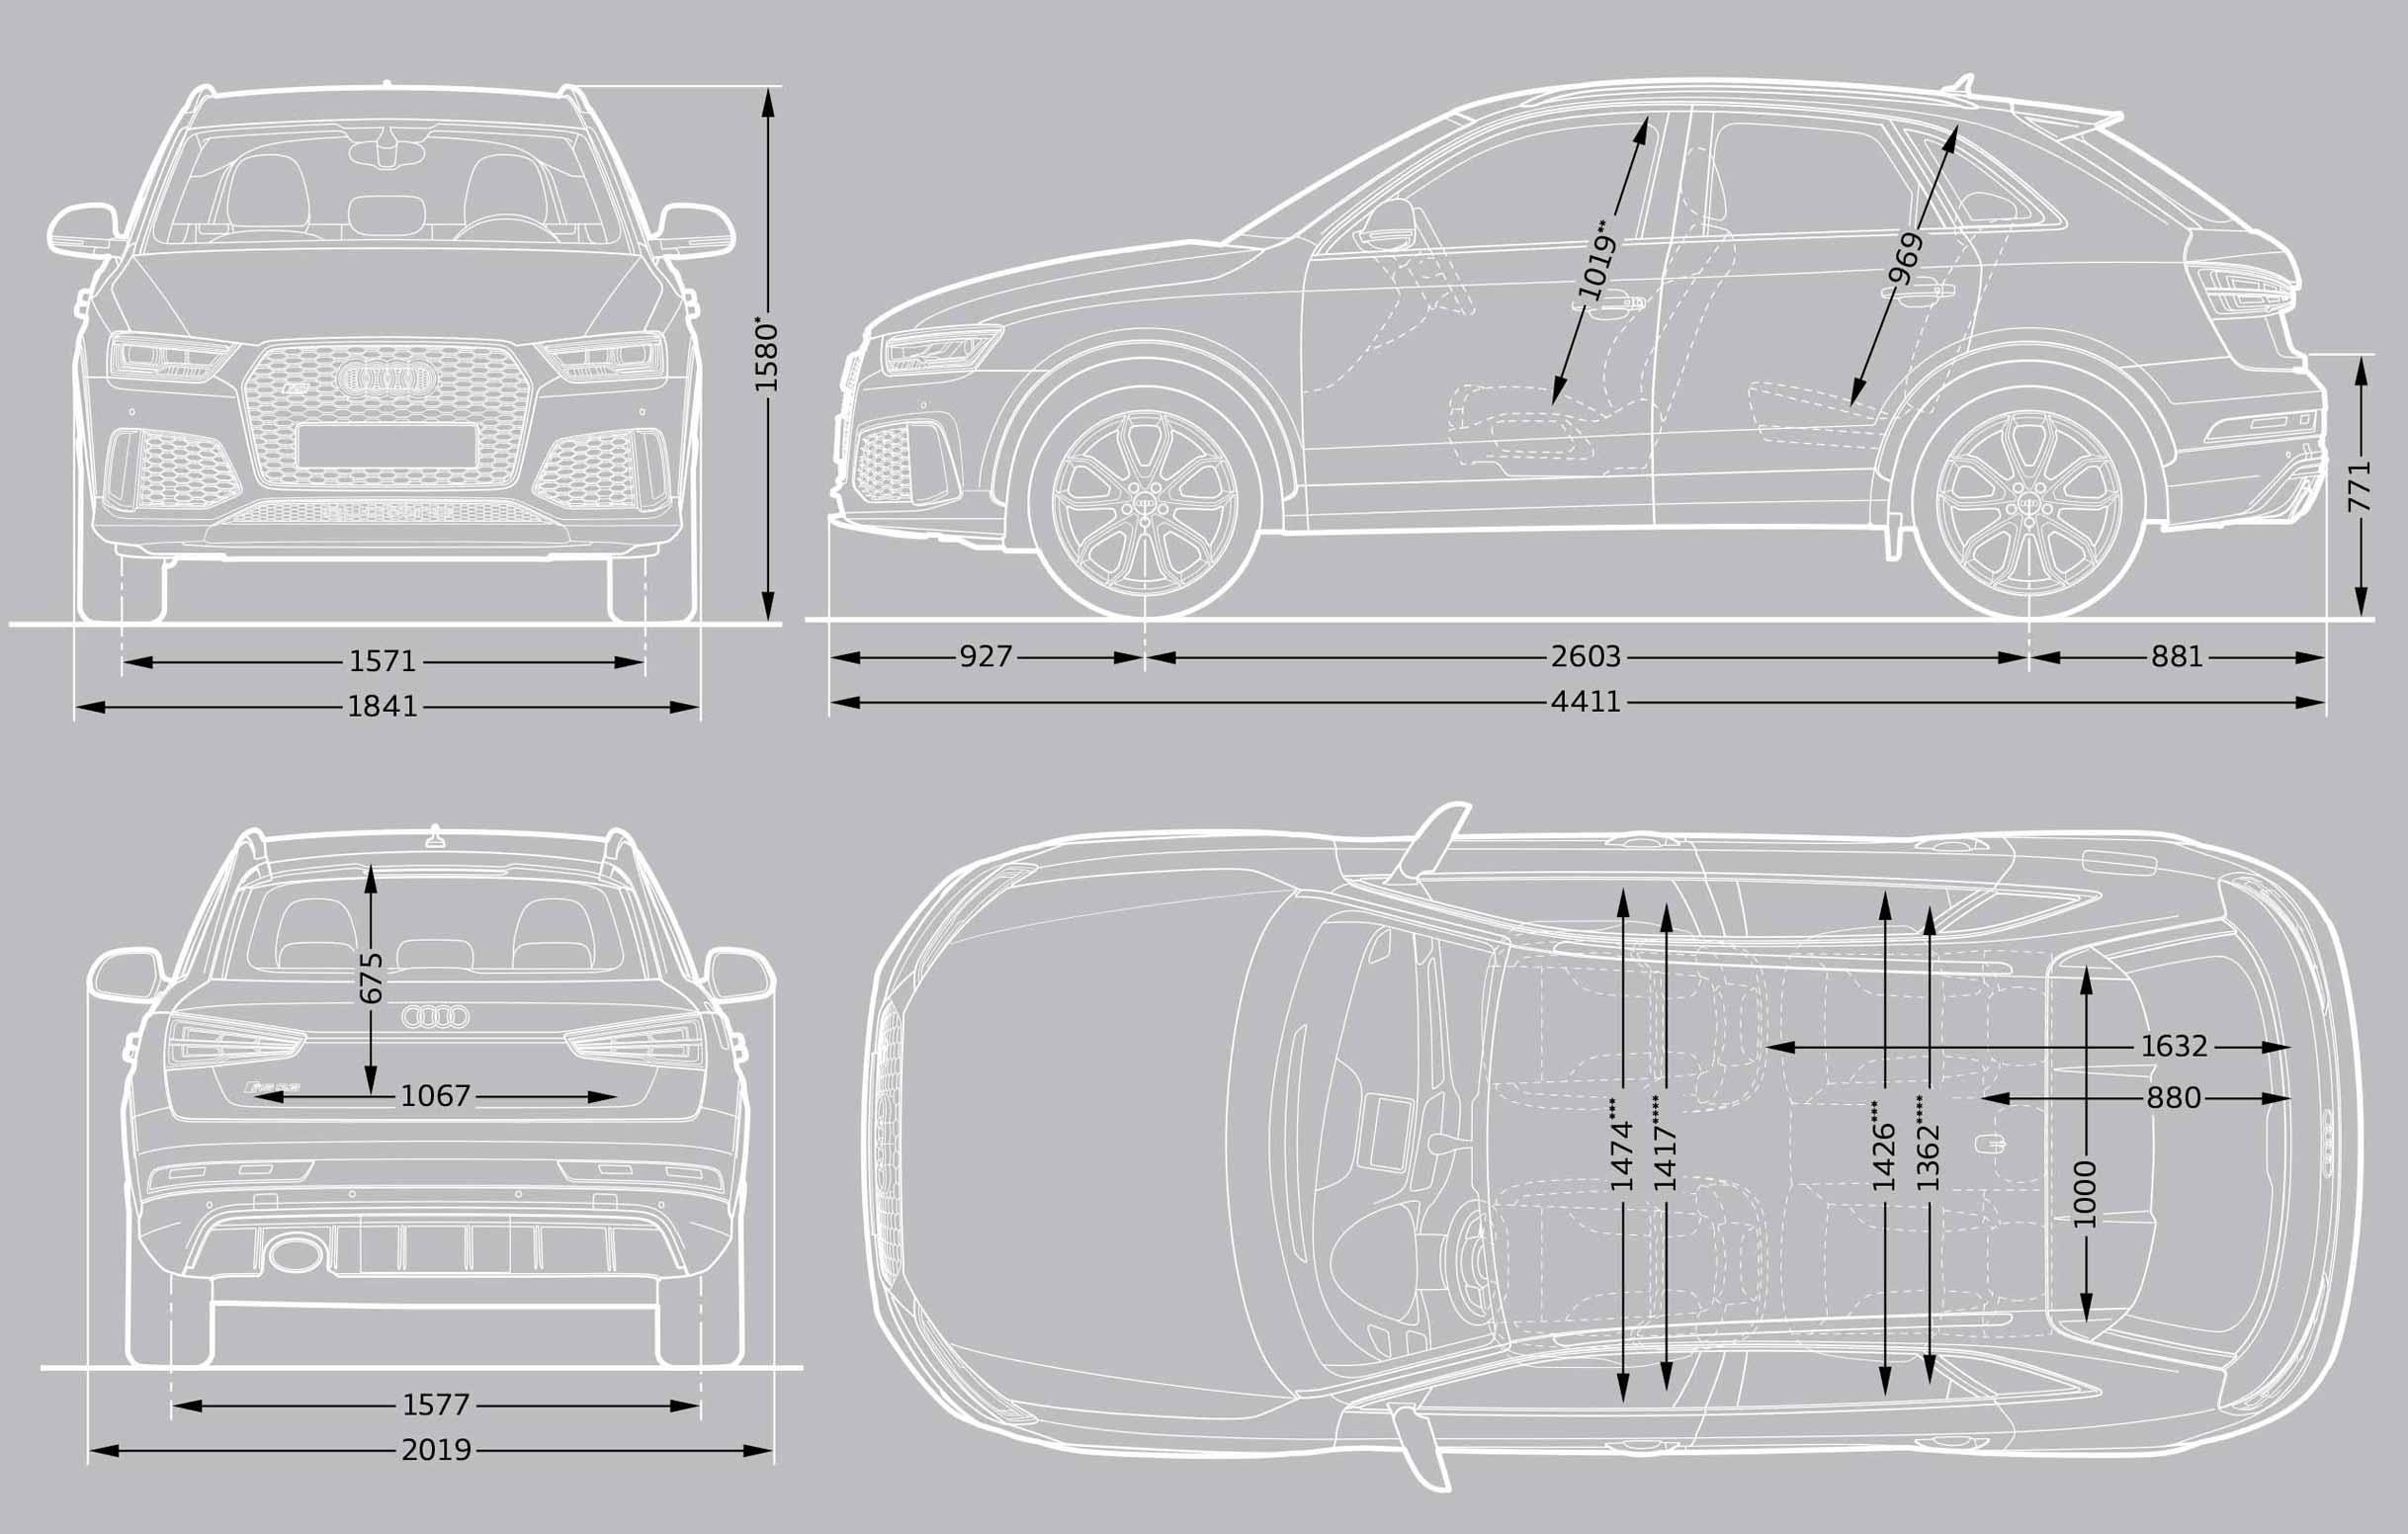 Q5 Dimensions Audi Q5 Interior Dimensions Audi Sq5 3 0